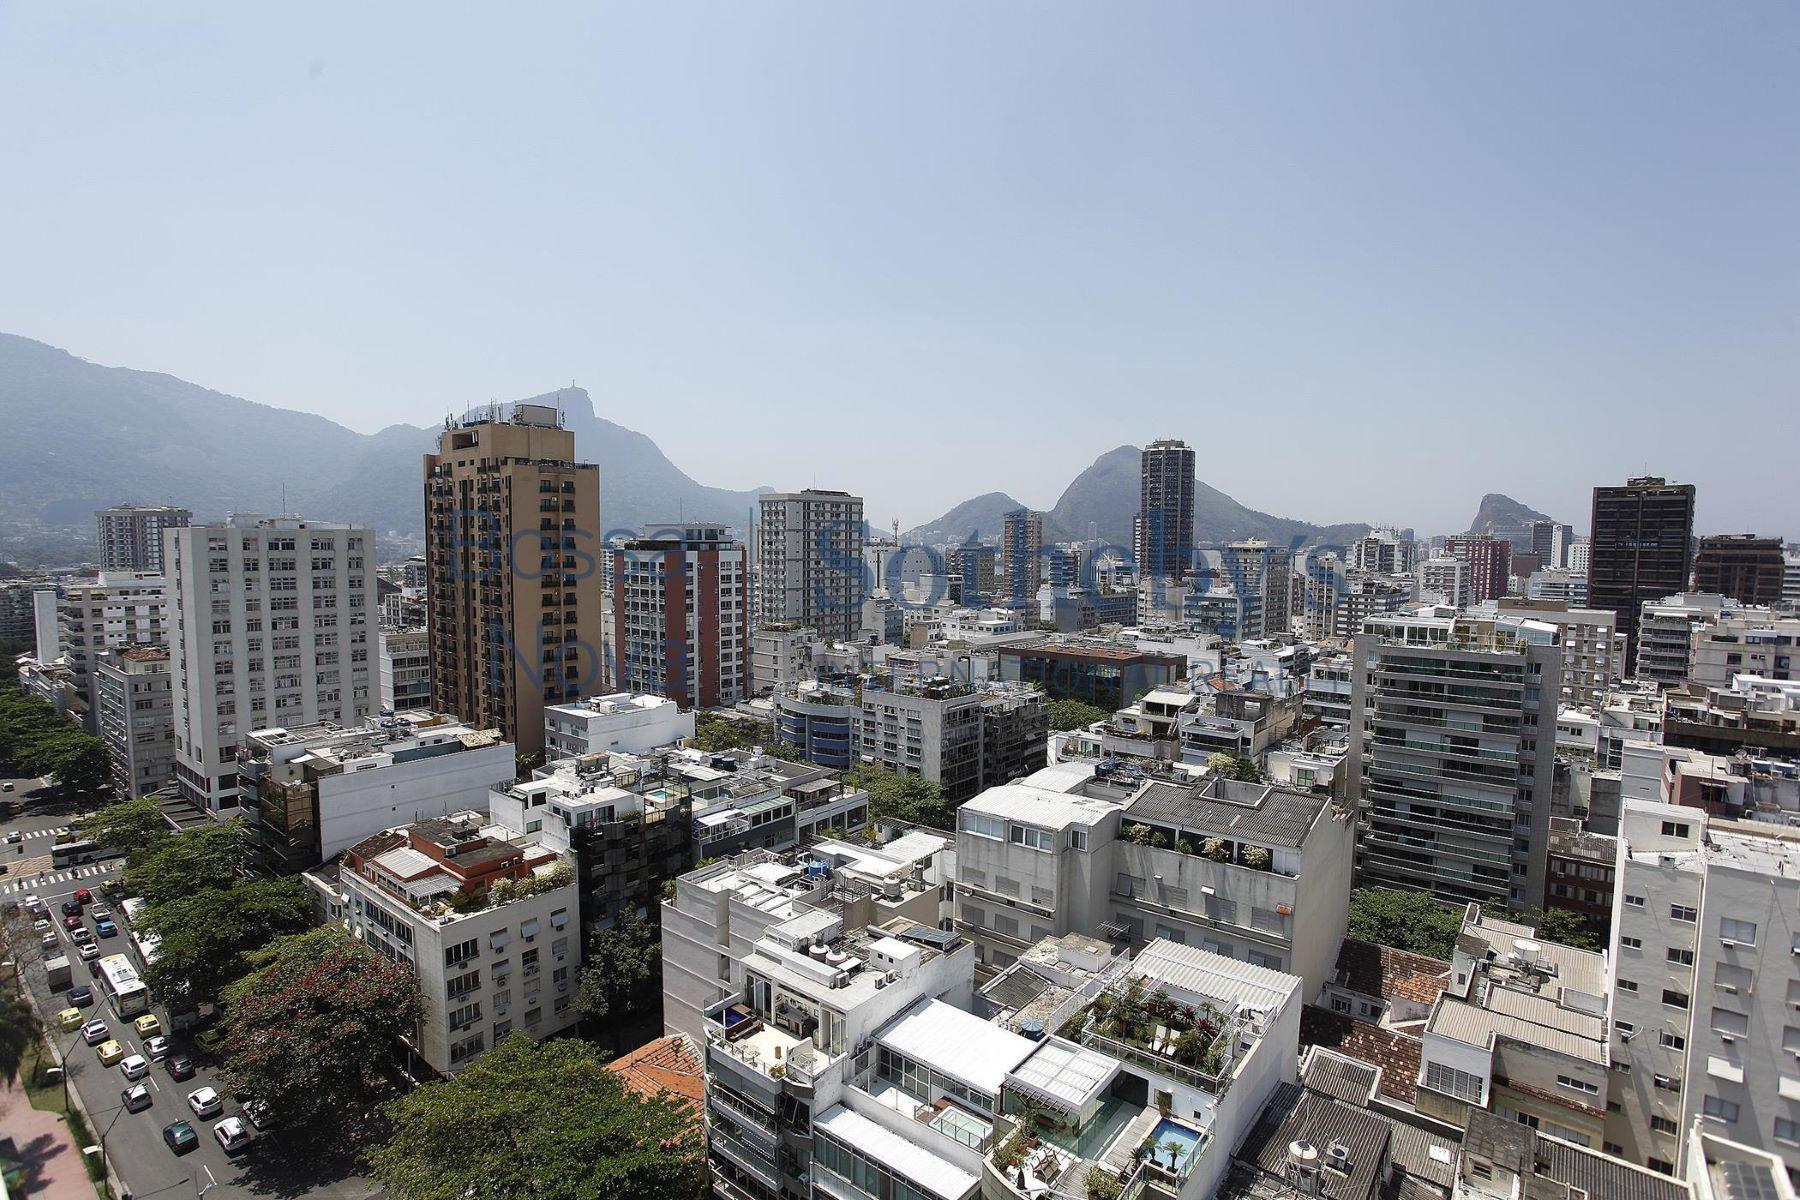 Single Family Home for Sale at View to Leblon Beach Rio De Janeiro, Rio De Janeiro, Brazil